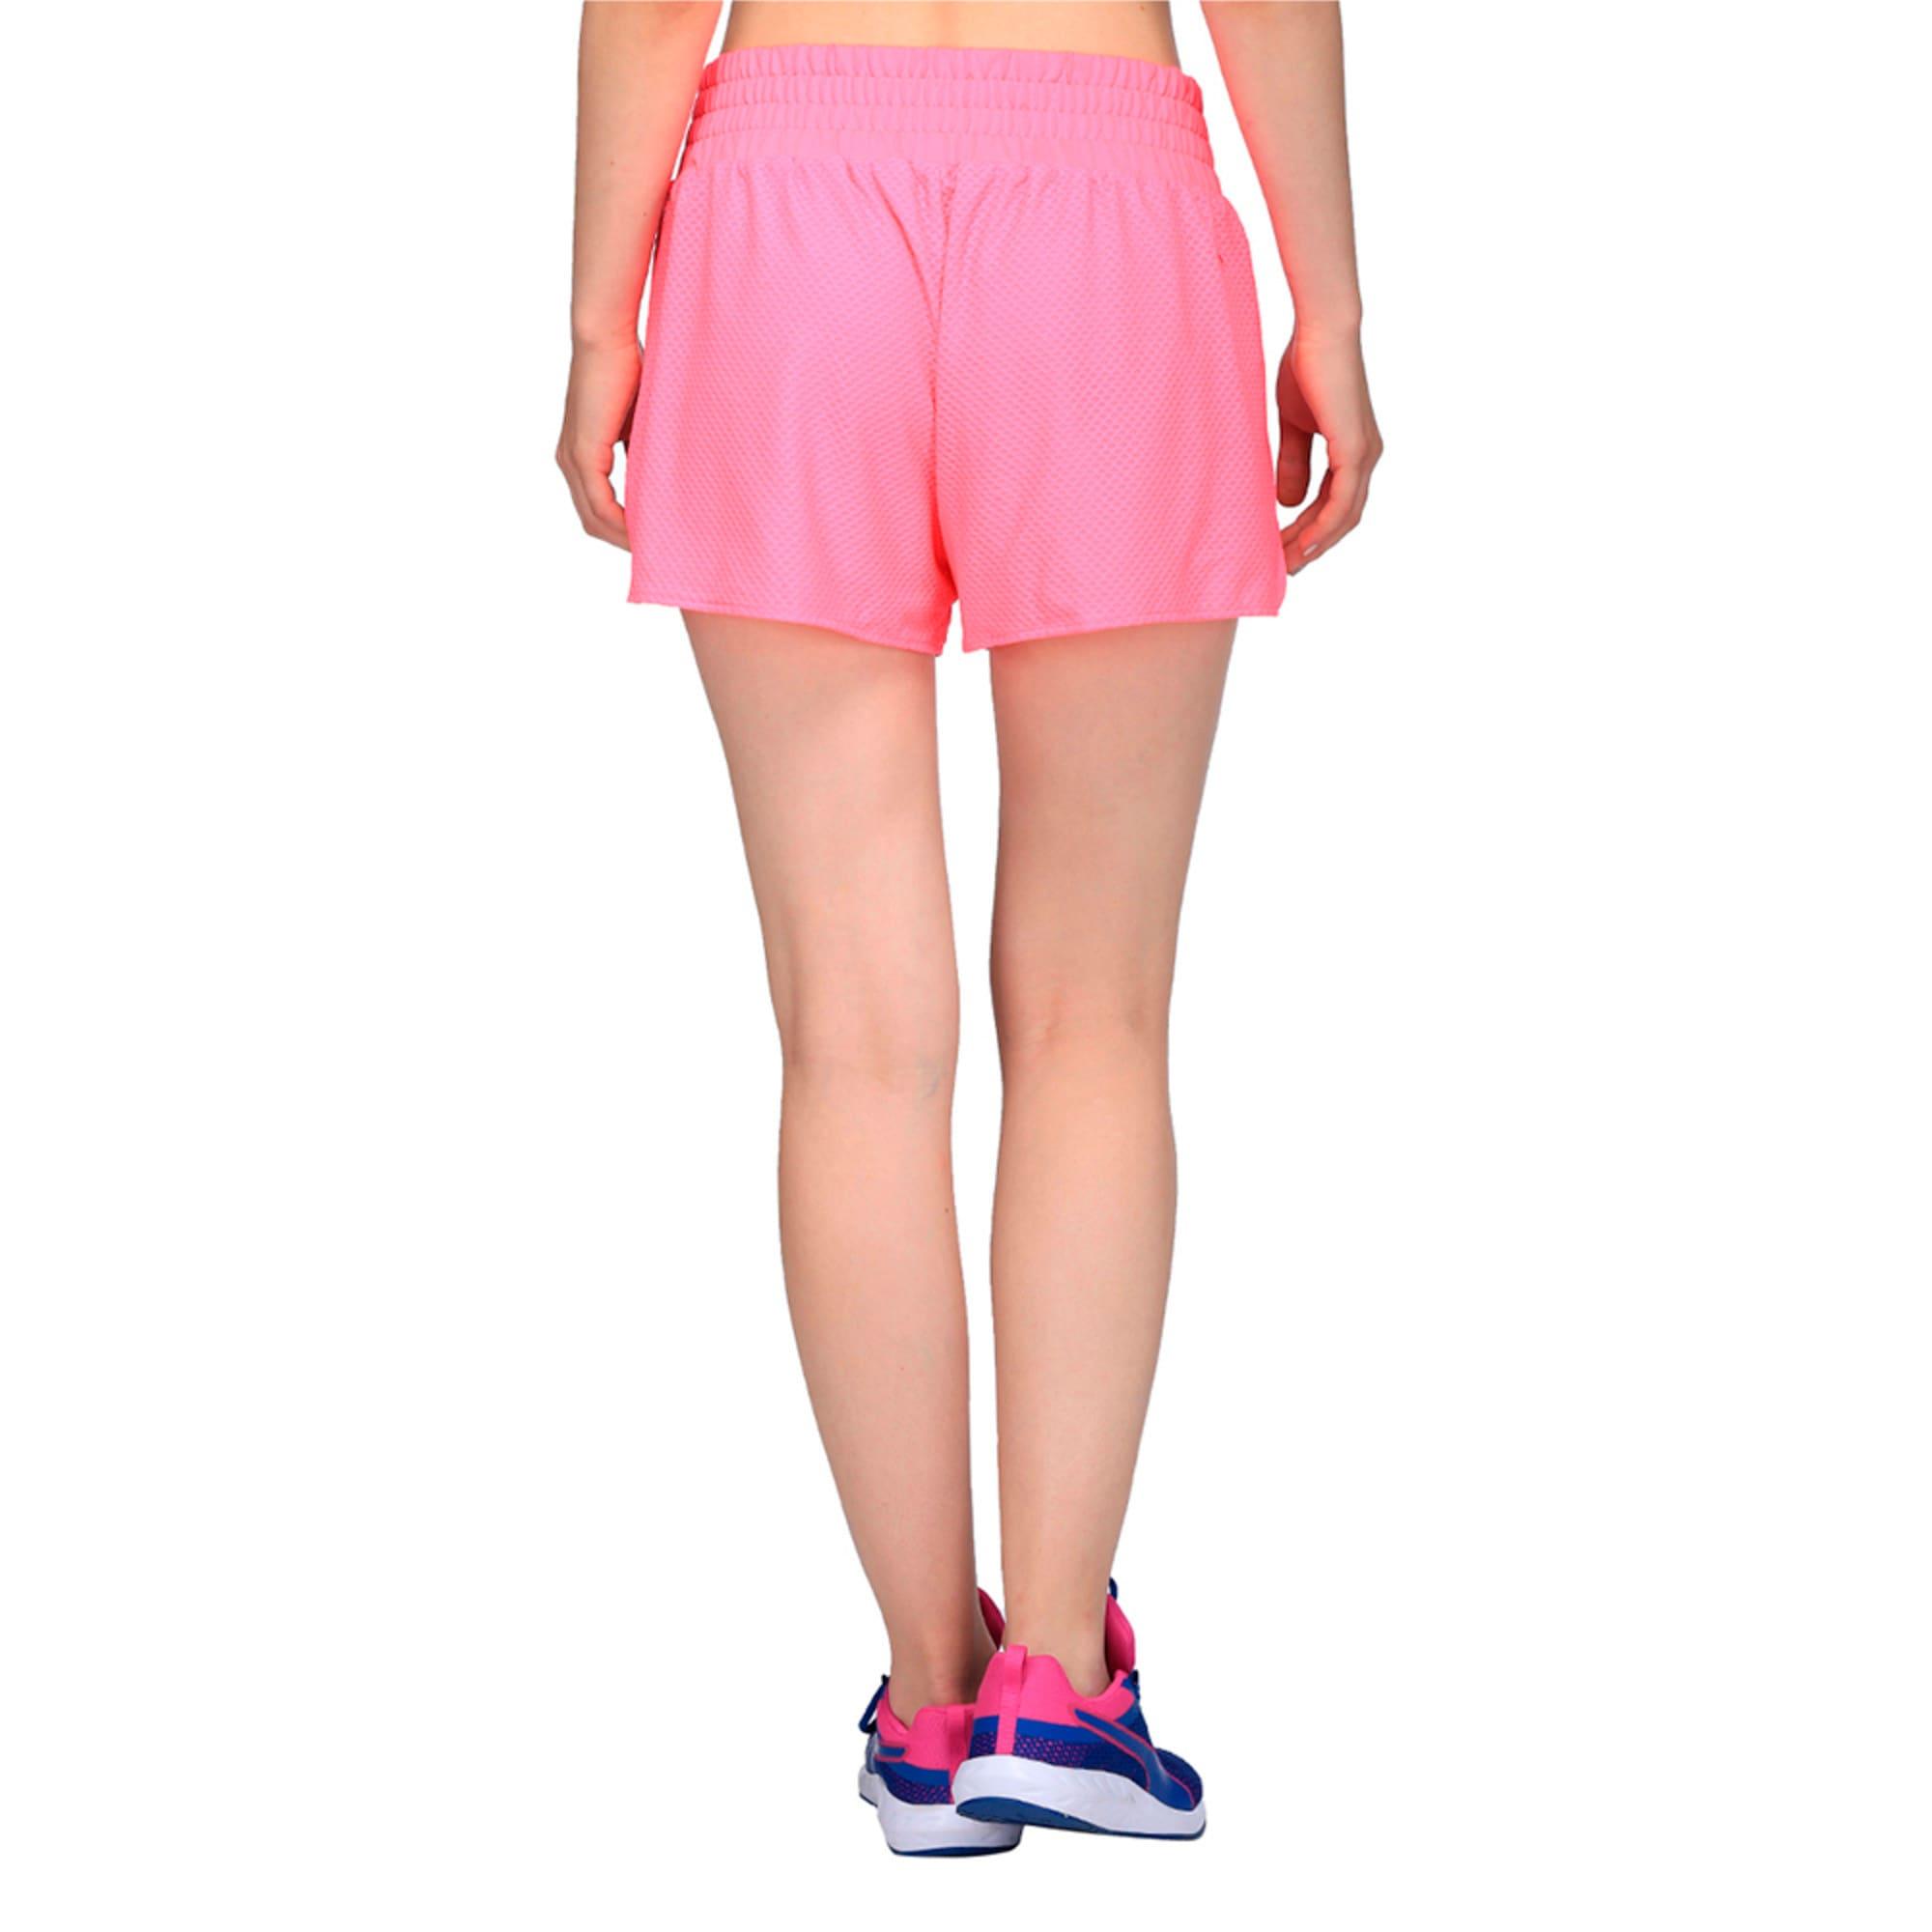 Thumbnail 2 of Active Training Women's Mesh Shorts, KNOCKOUT PINK, medium-IND